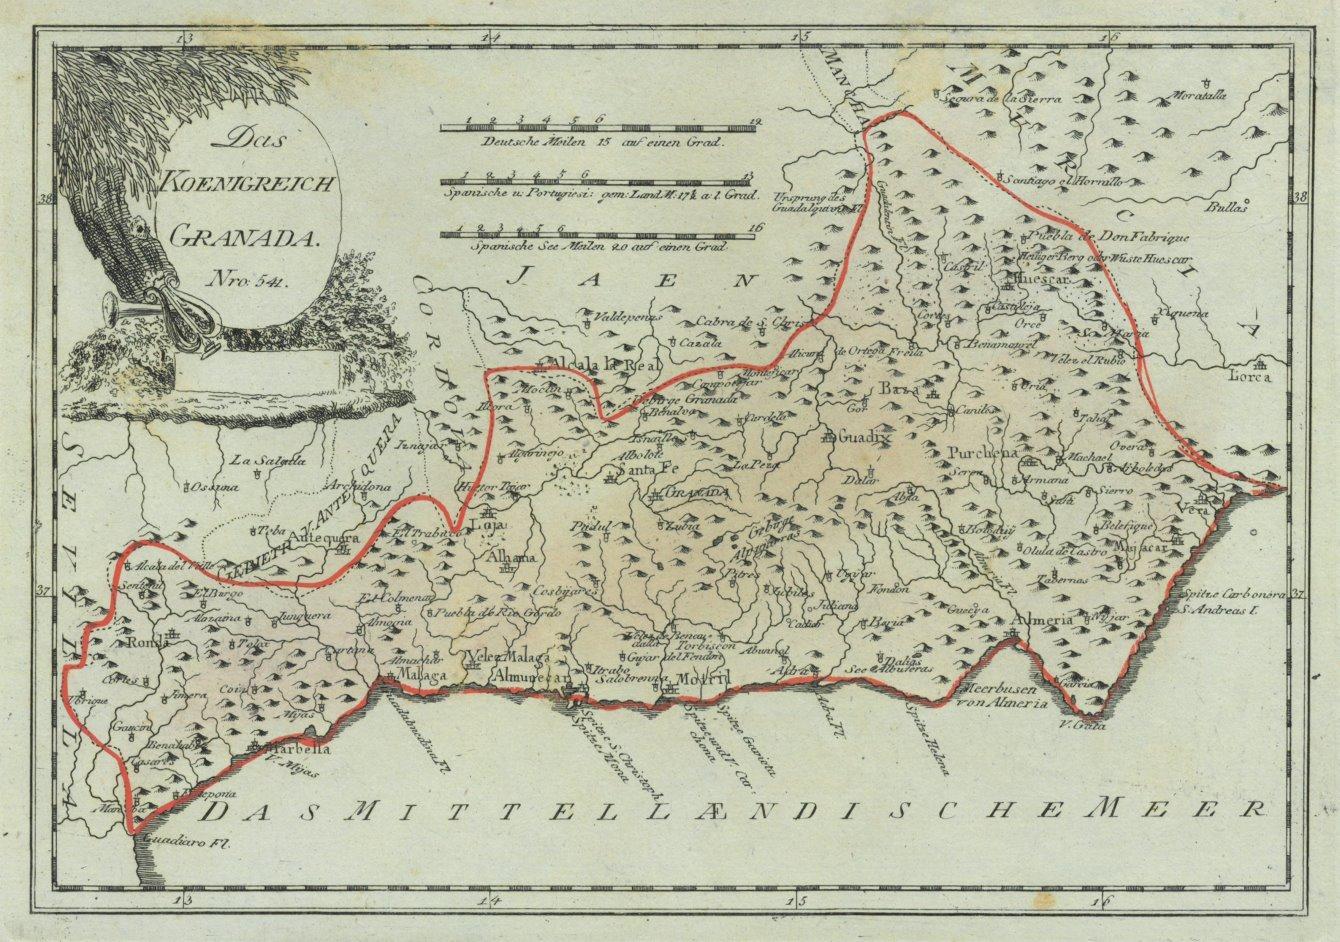 Granada Karte.Granada Karte